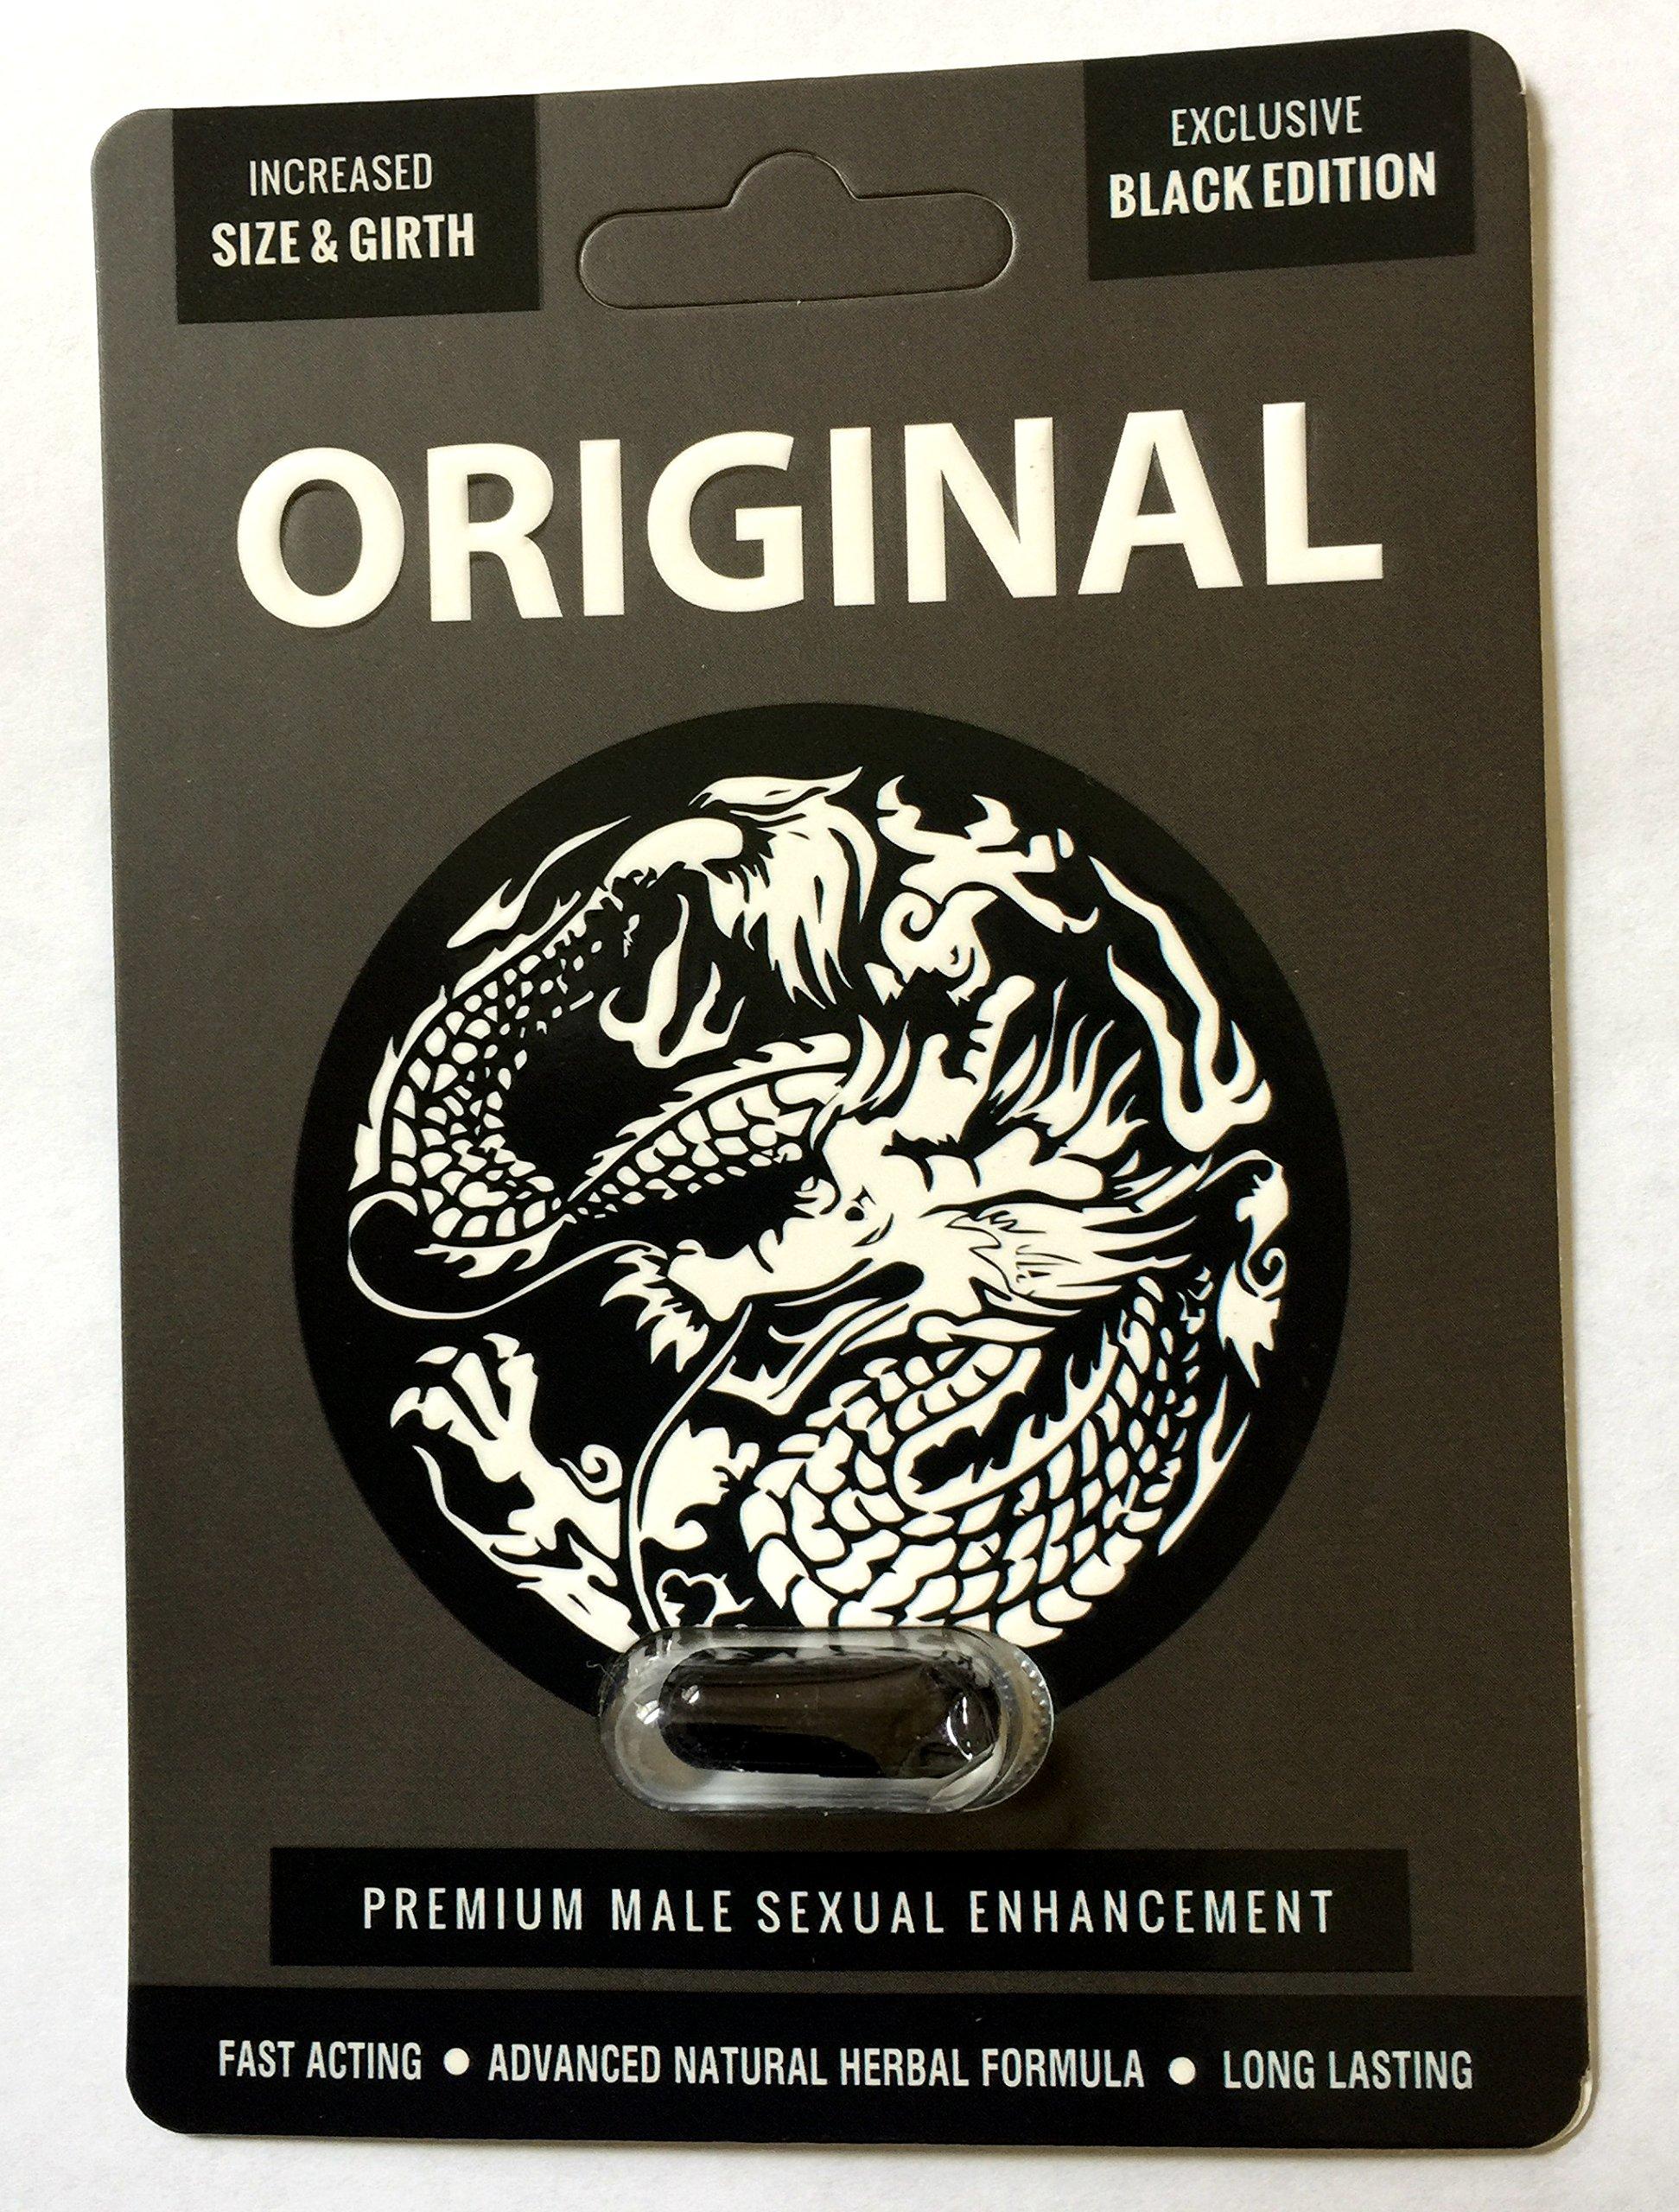 New White Dragon Original Black Male Enhancement Pills for Sex (4)